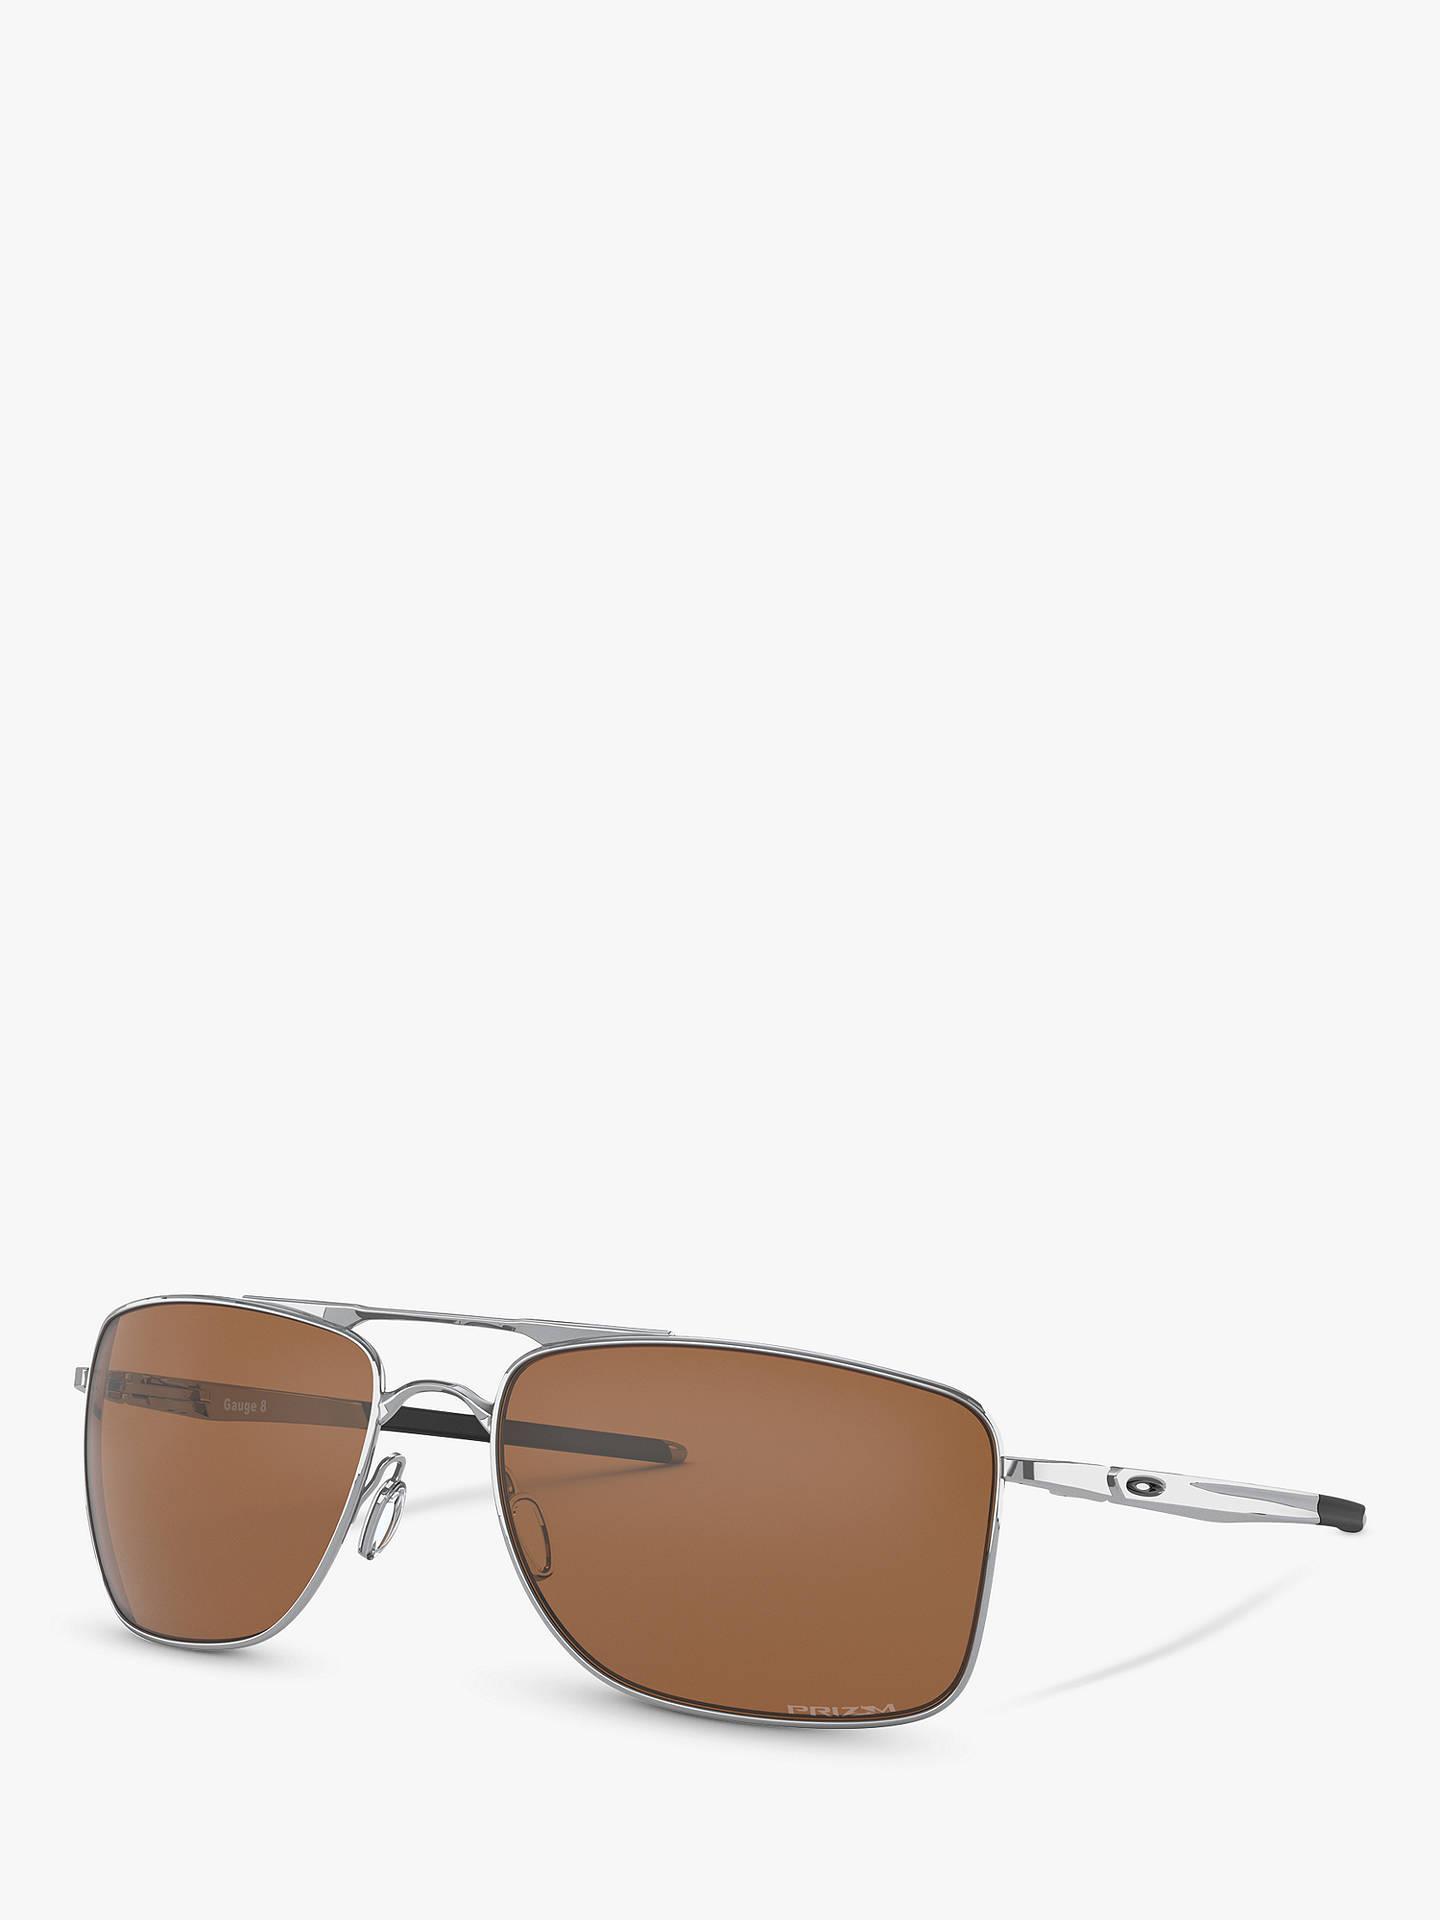 8d316e5de12e1 Buy Oakley OO4124 Men s Rectangular Sunglasses